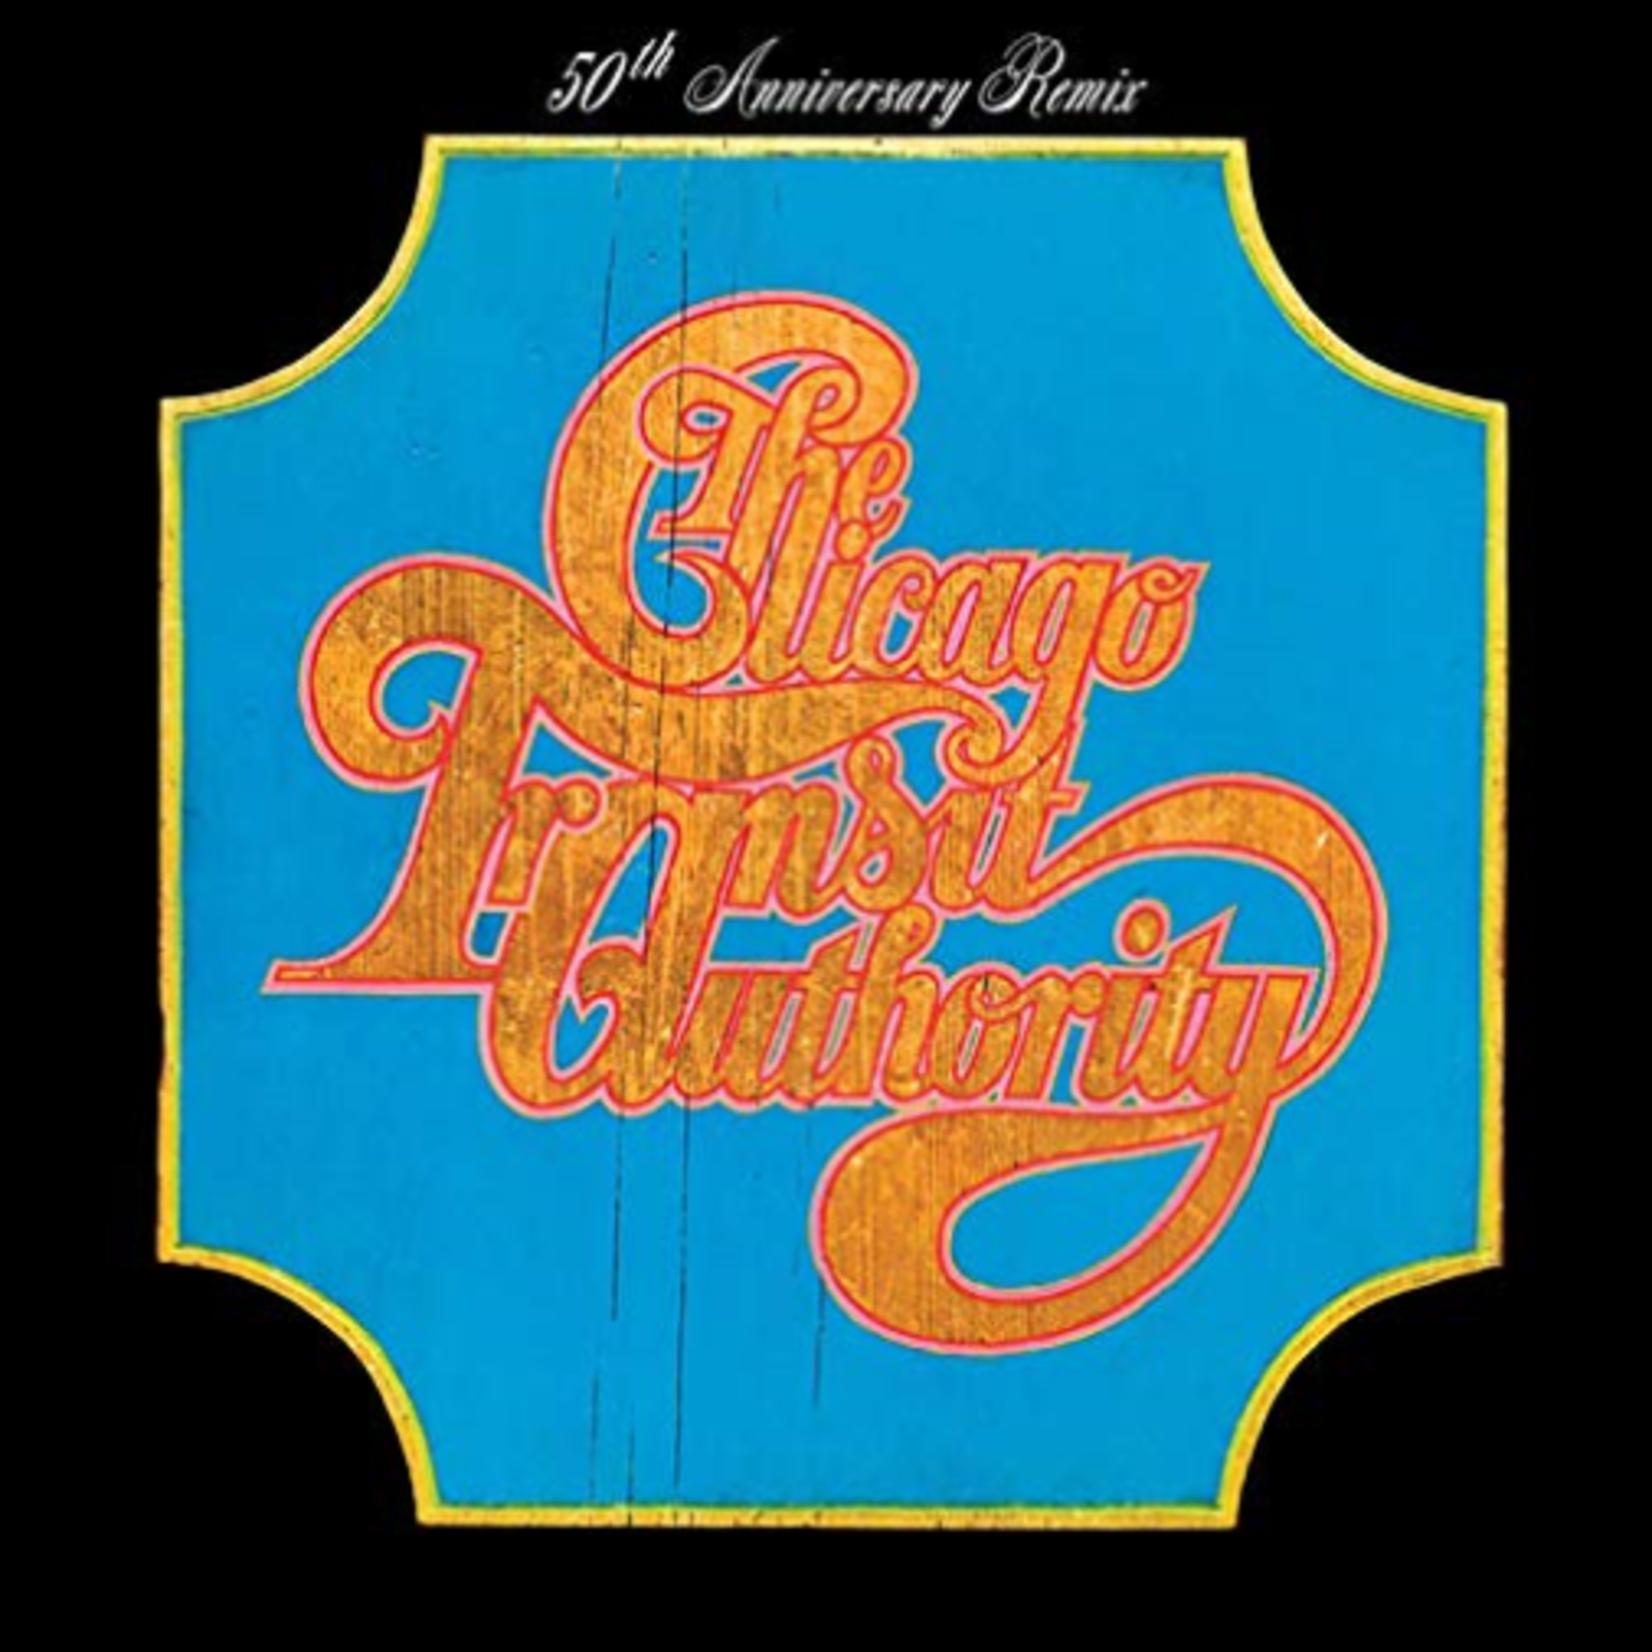 CHICAGO  CHICAGO TRANSIT AUTHORITY (50TH ANNIVERSARY REMIX 2LP)